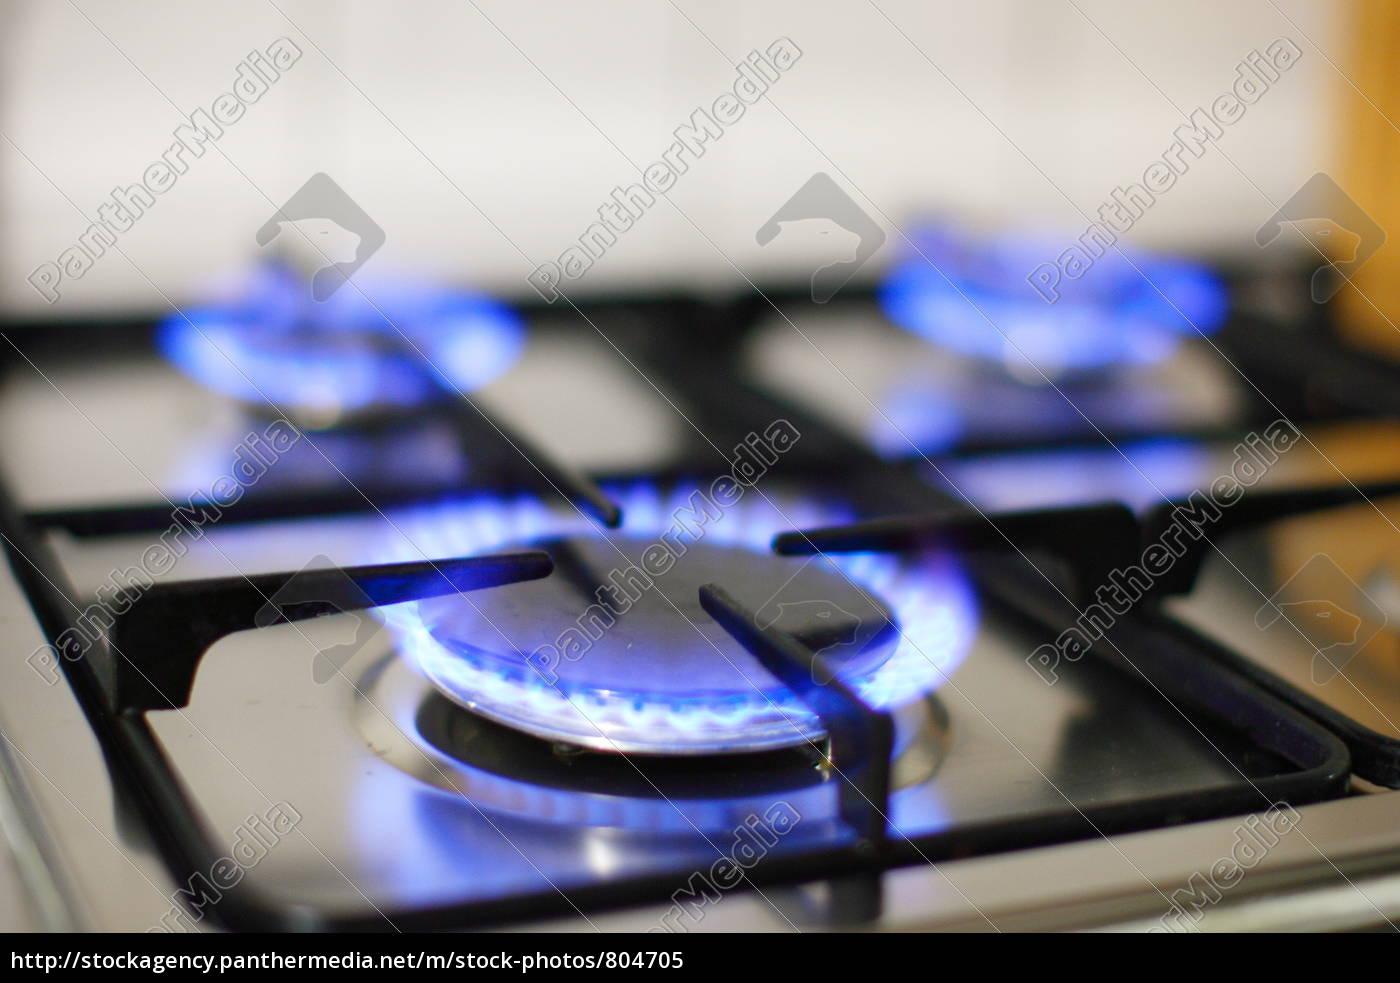 gas, cooker - 804705